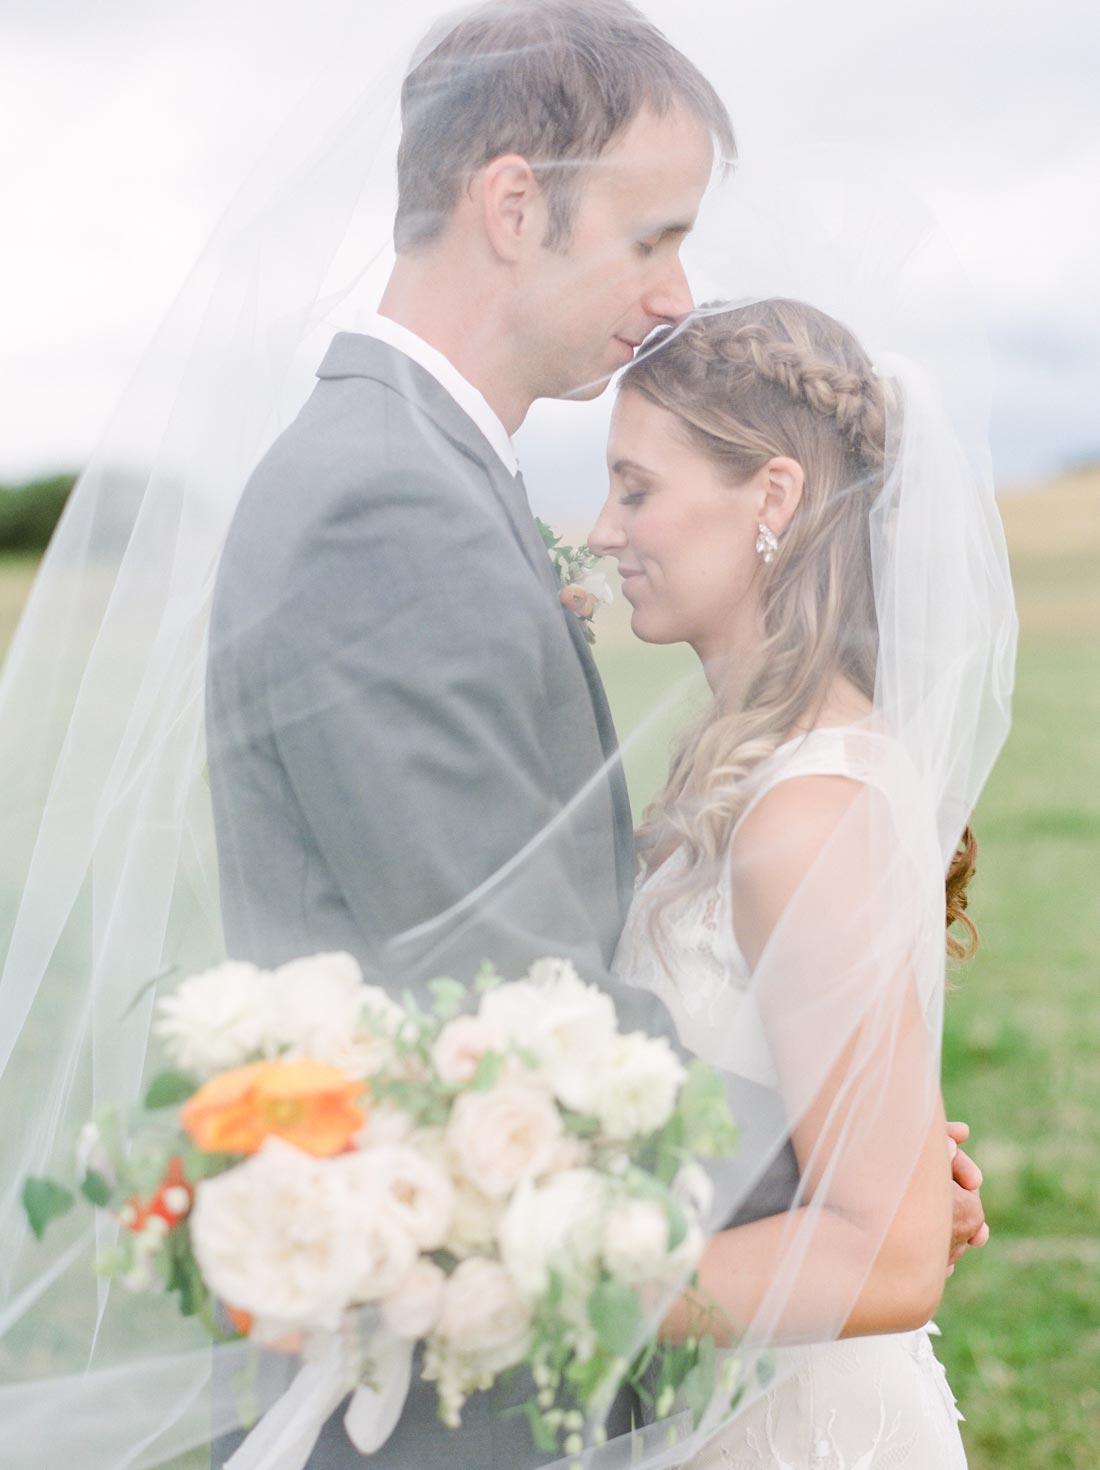 Megan_Zack_Cedar_Ridge_Ranch_Wedding_by_Connie_Whitlock_web_373-2.jpg